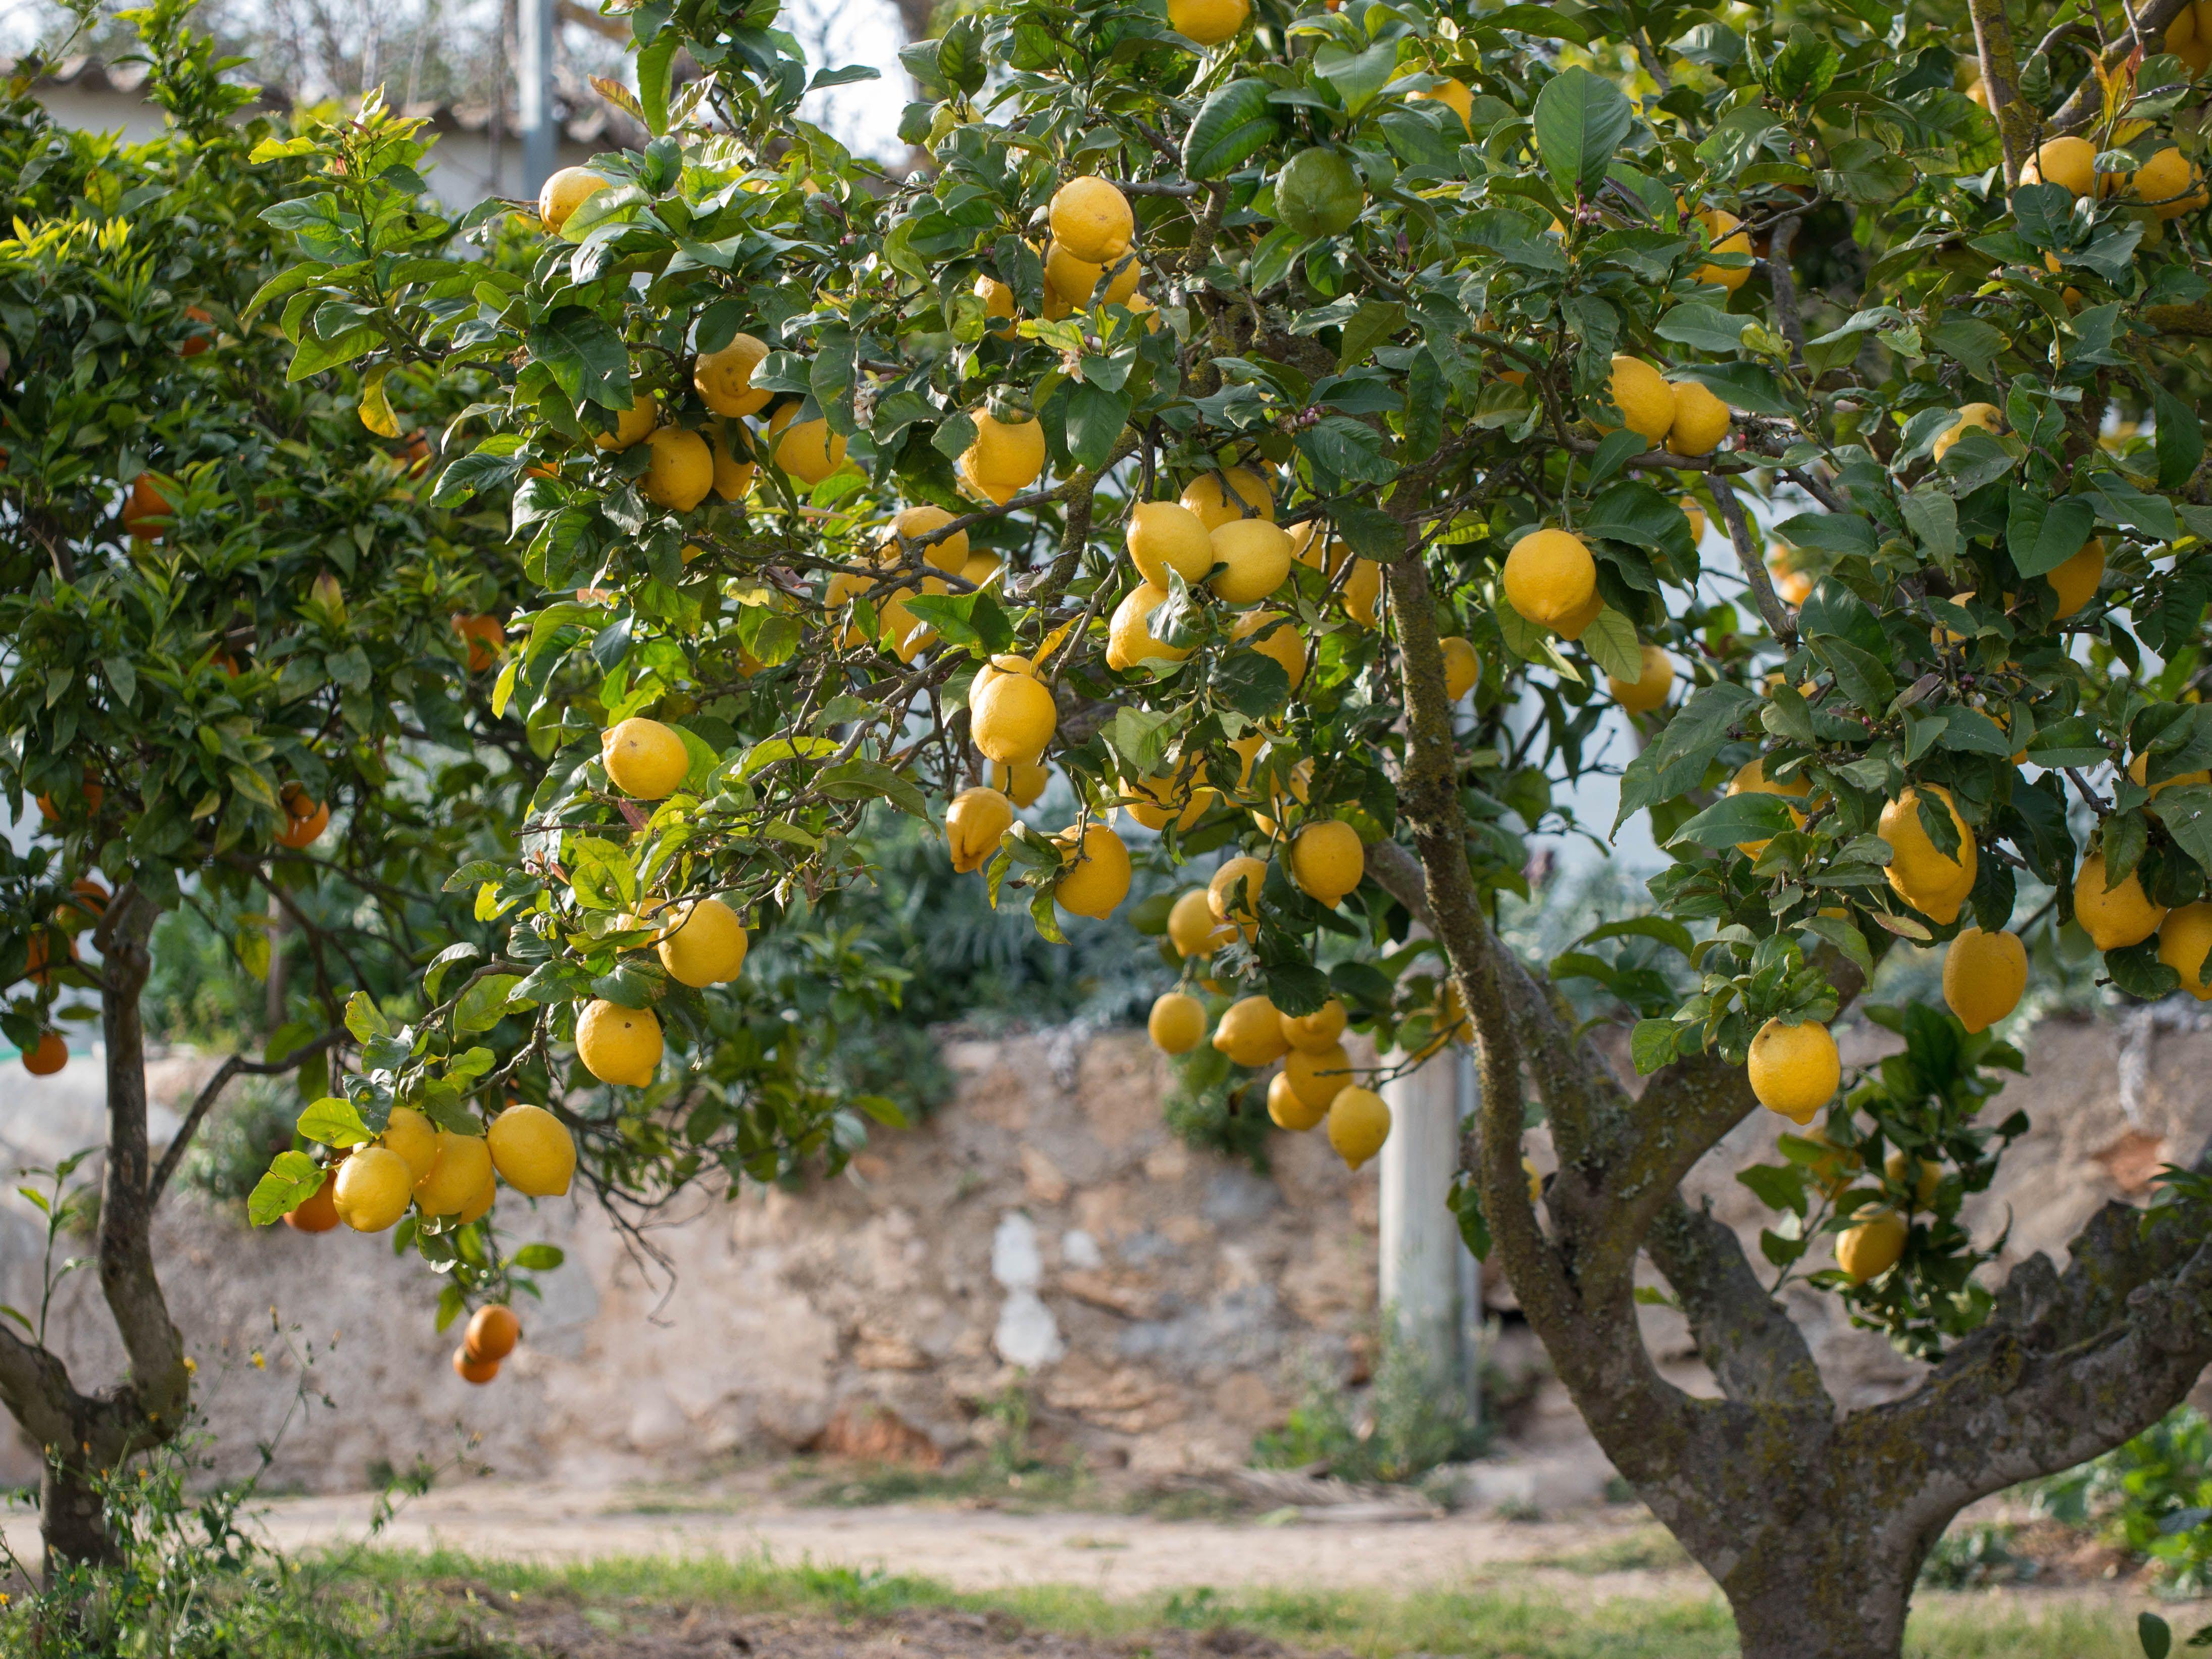 zitronenbaum wirft blätter ab | zitruspflanzen im mediterranen, Gartengerate ideen